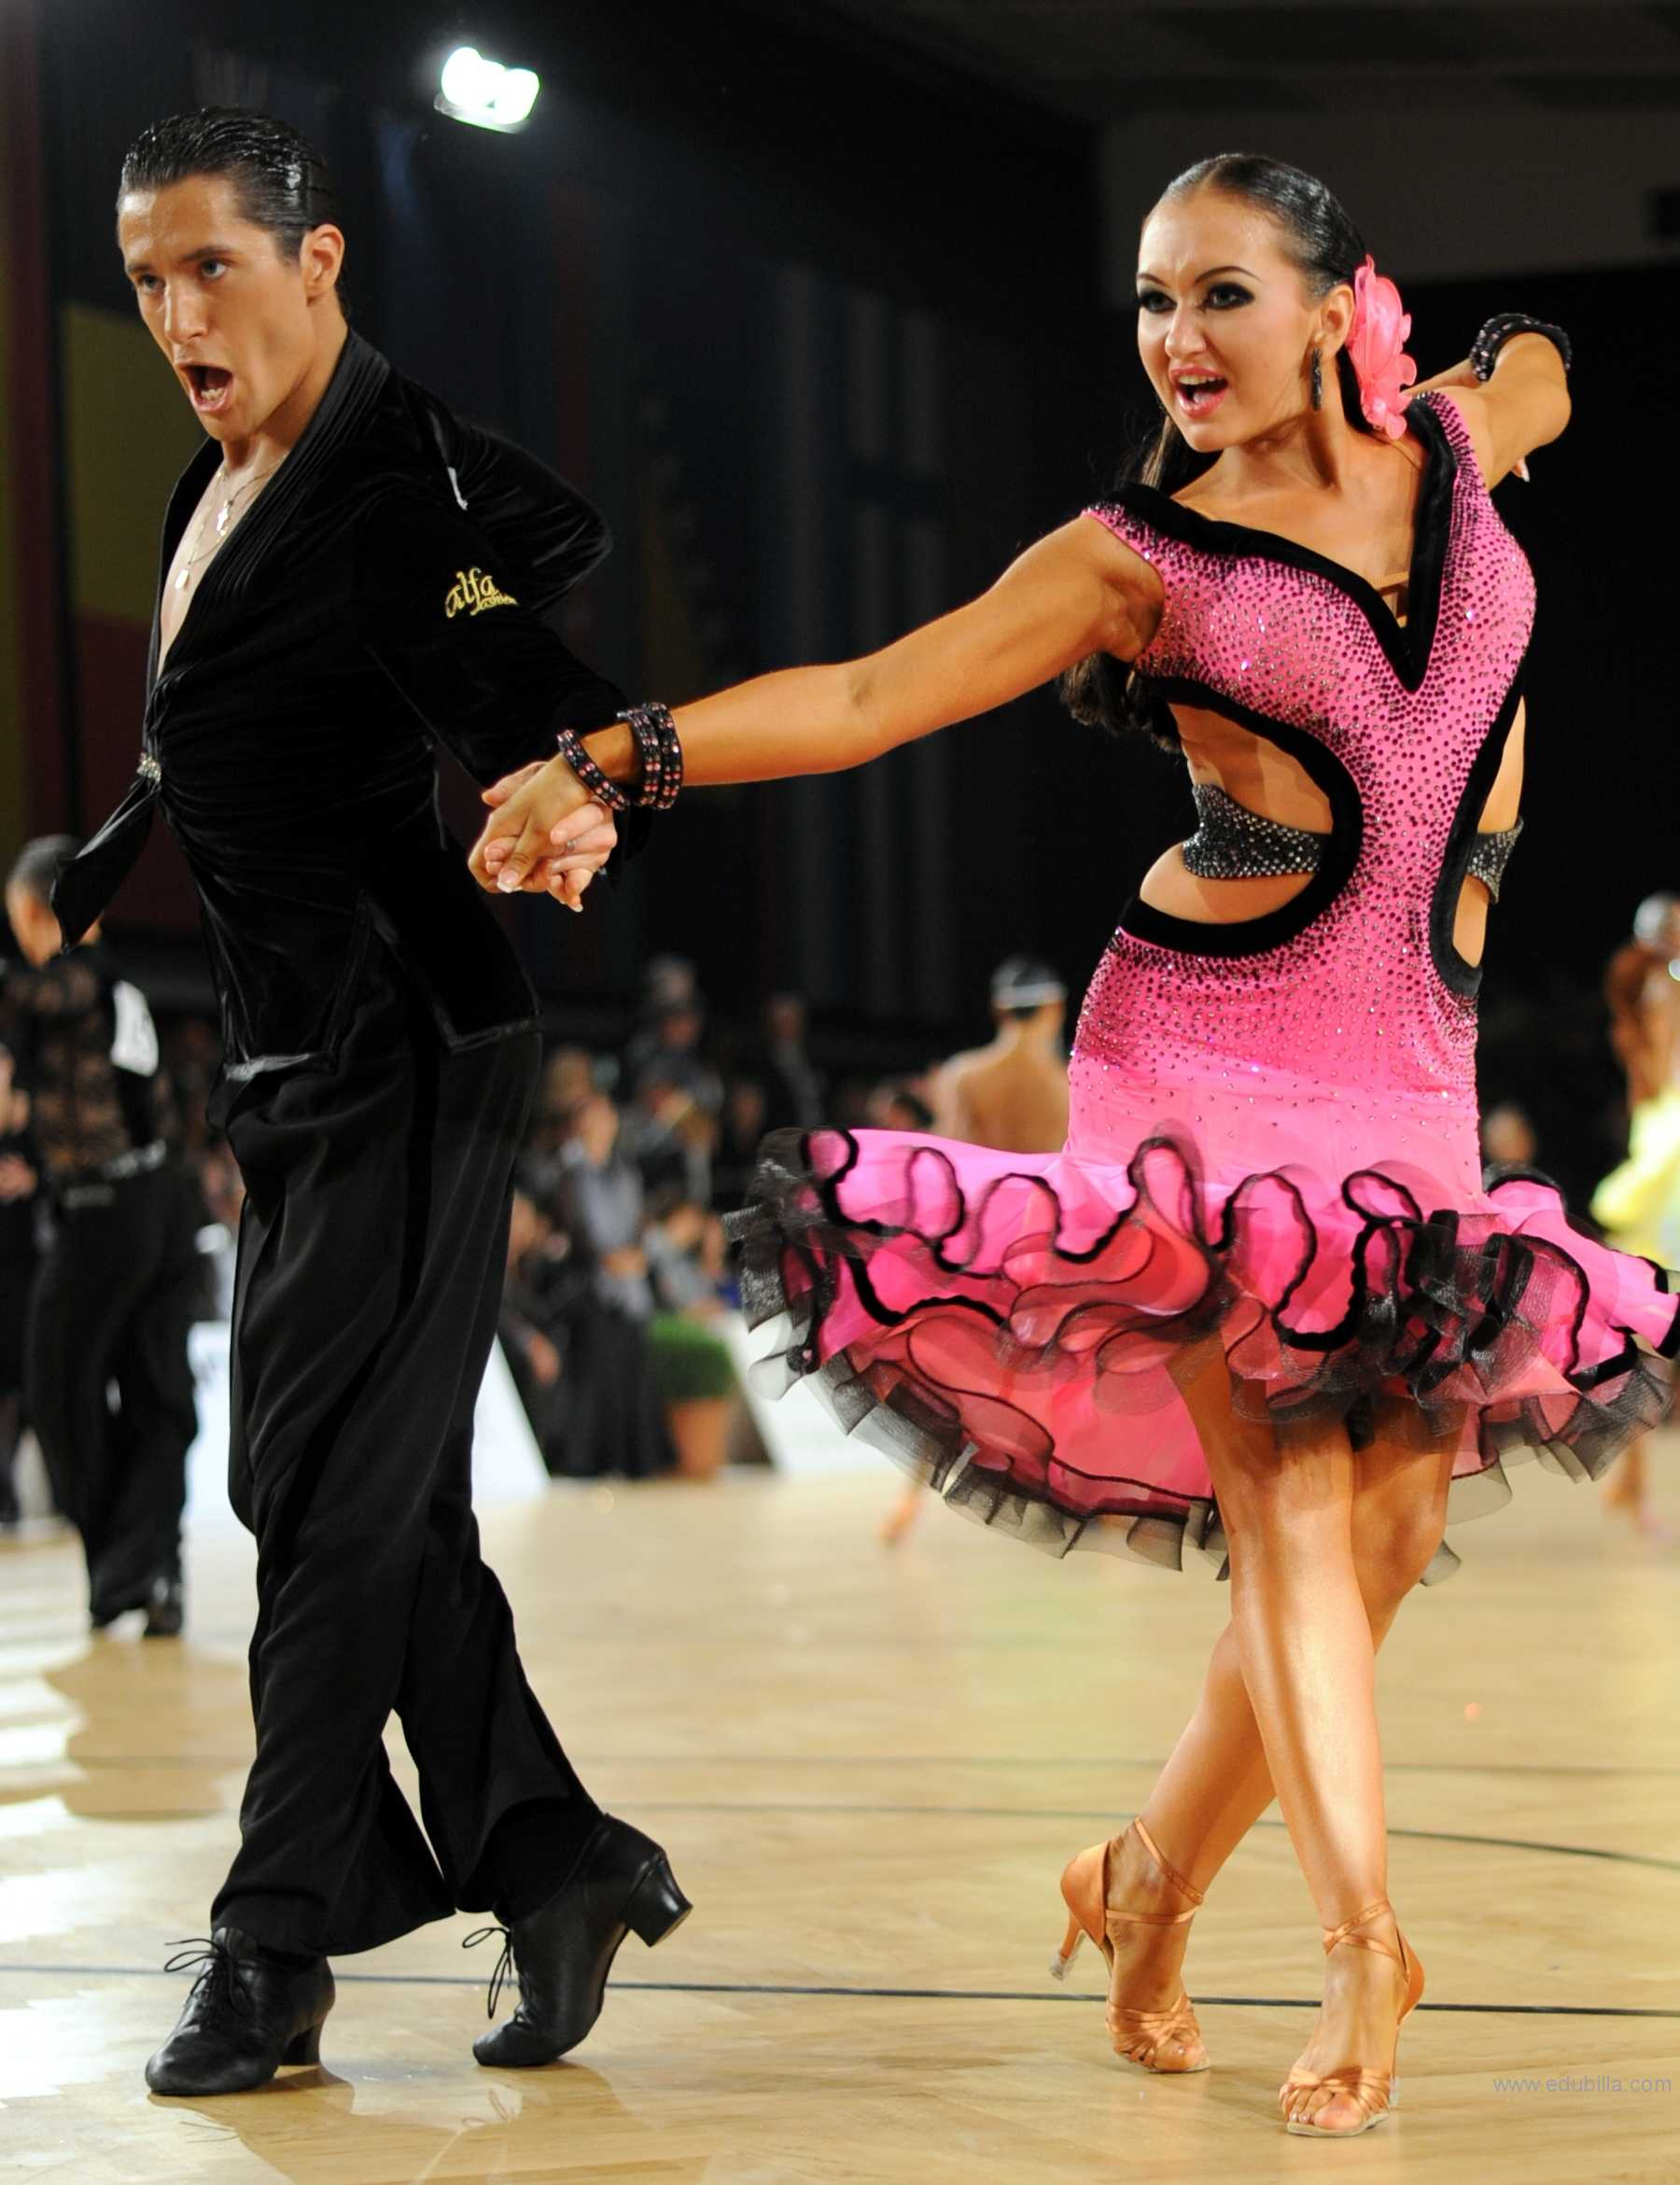 ballroomdance9.jpg